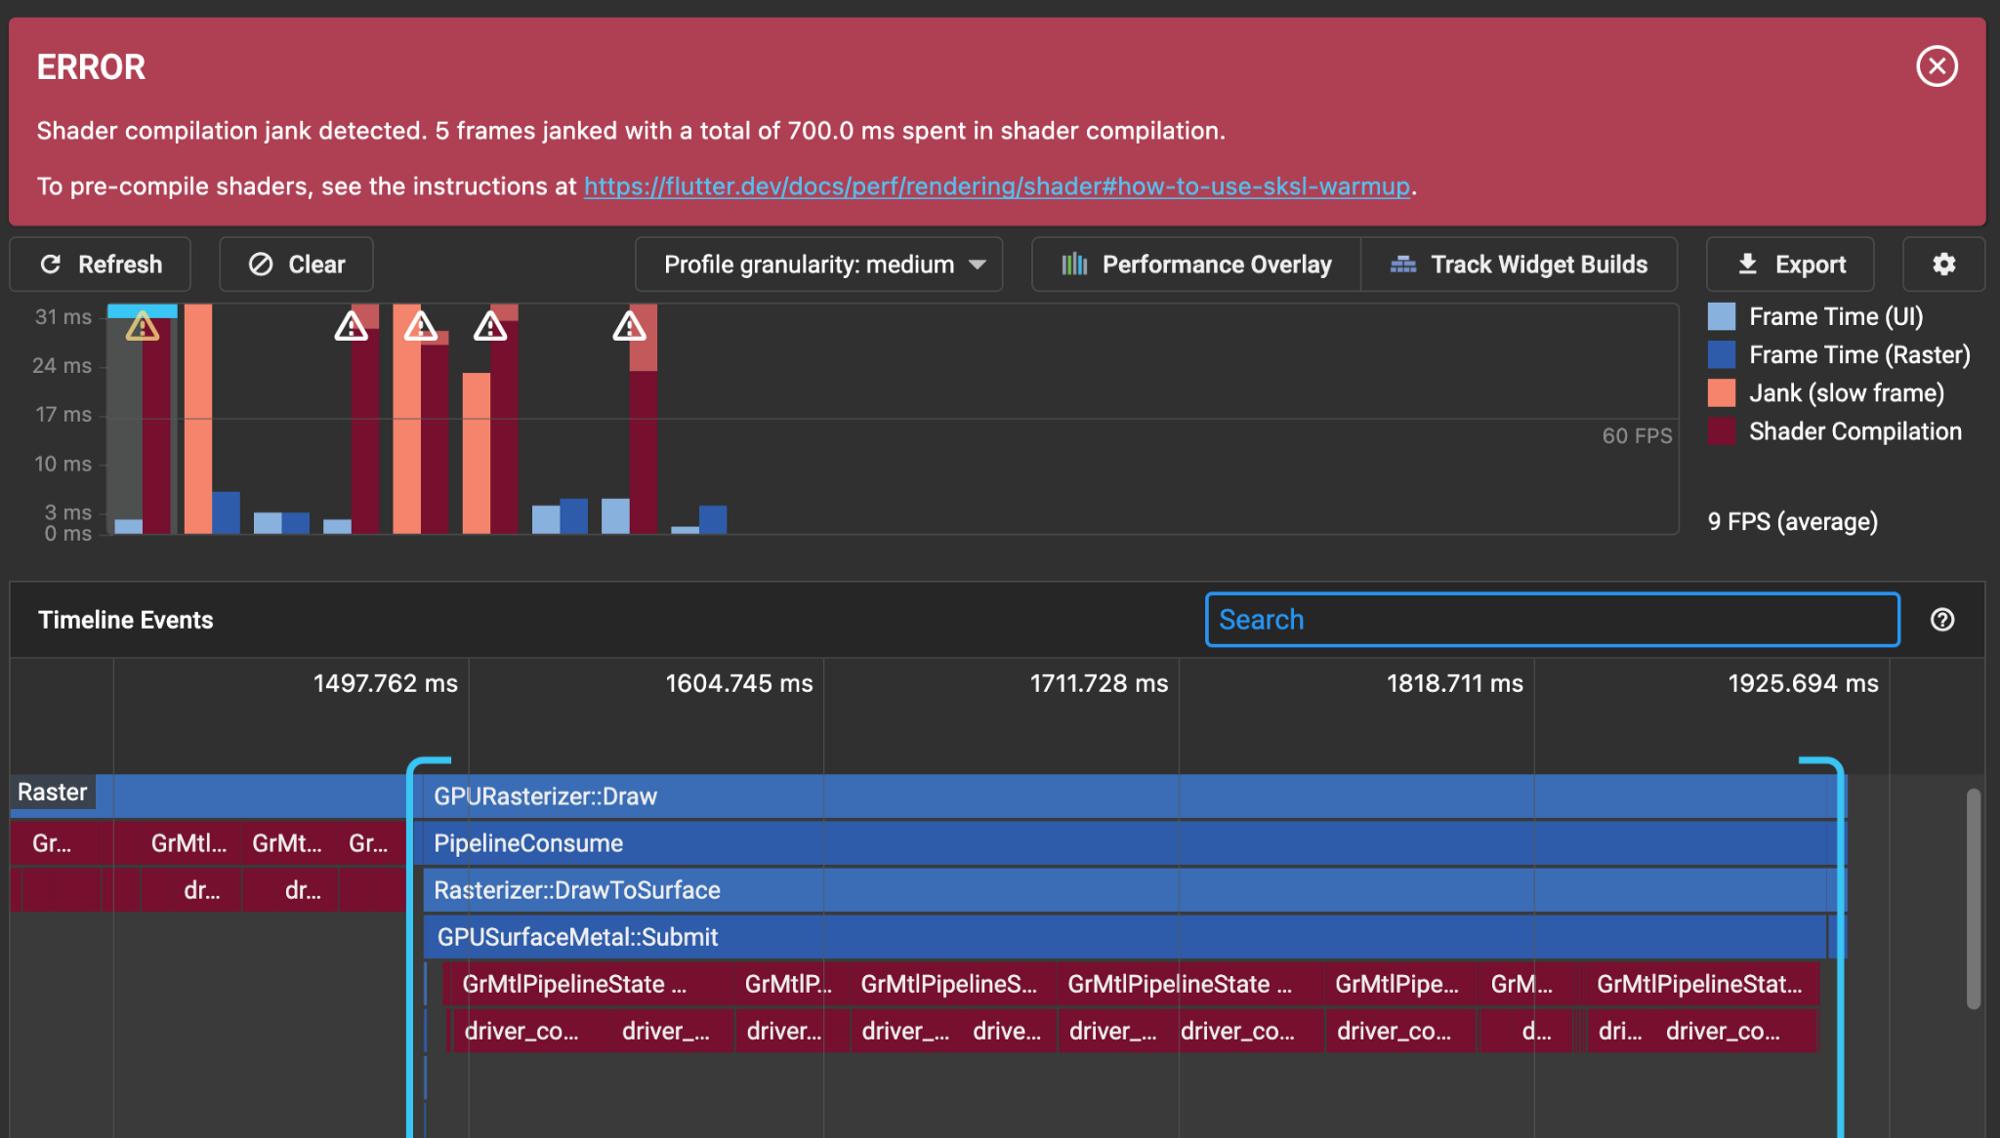 DevTools detecting lost frames due to shader compilation